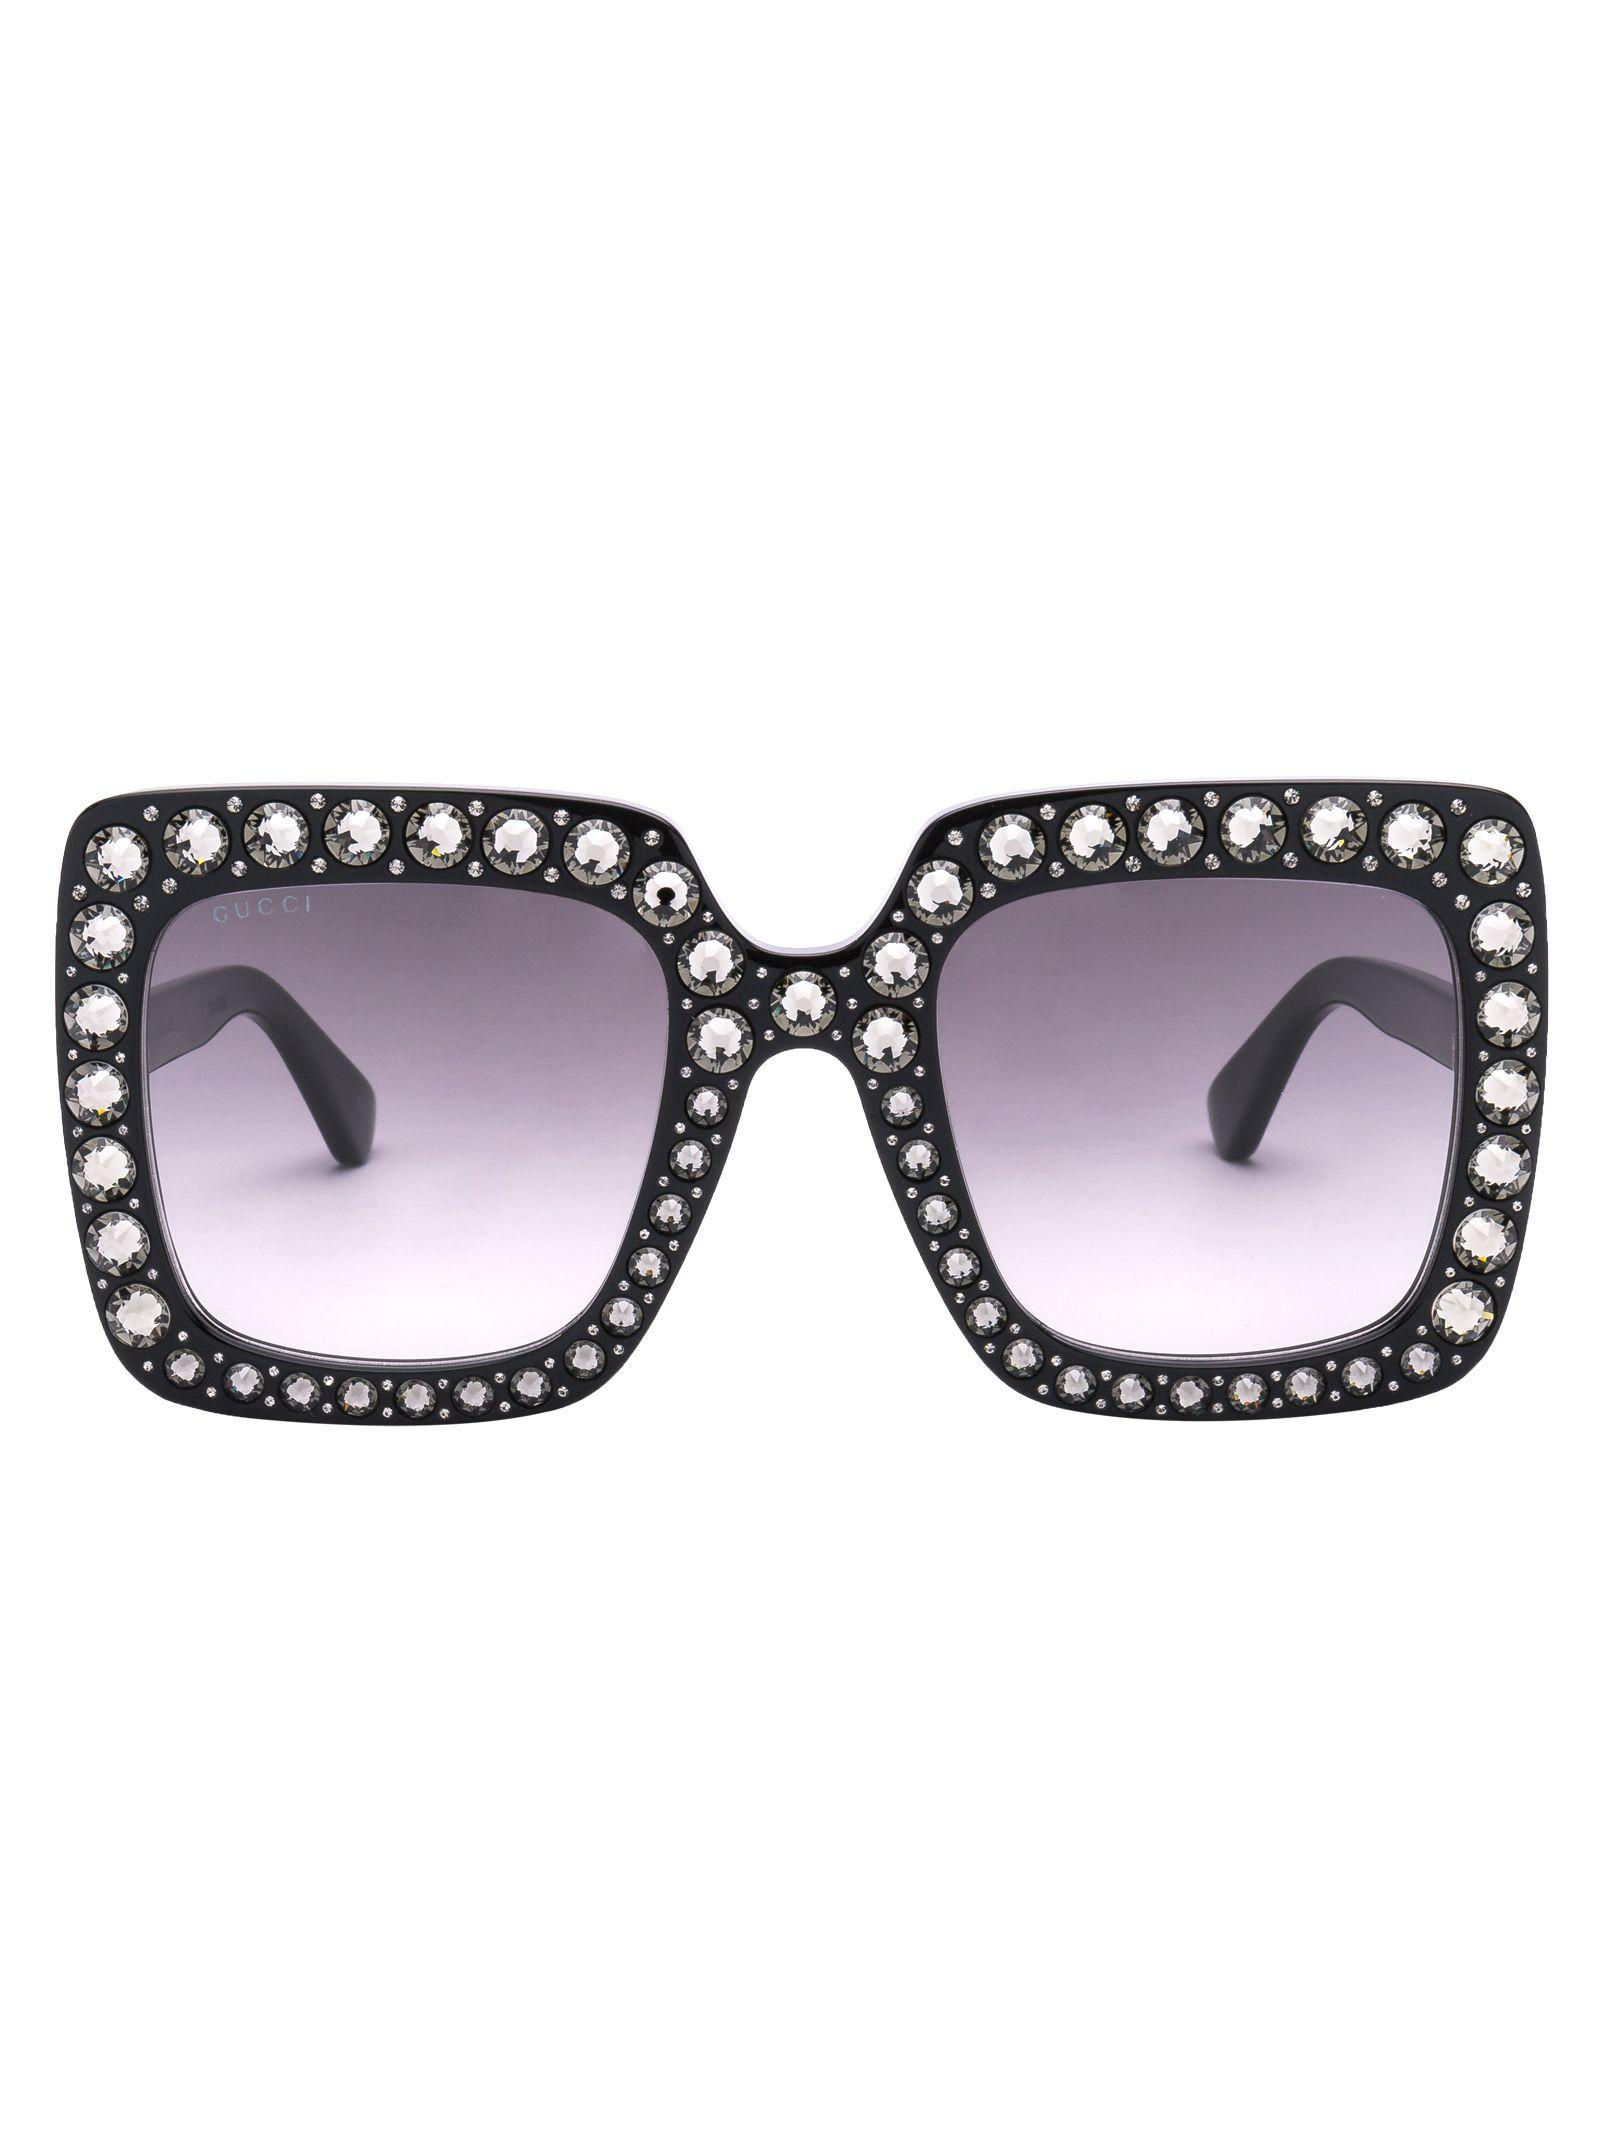 Eyewear Crystals Applique Sunglasses in C001